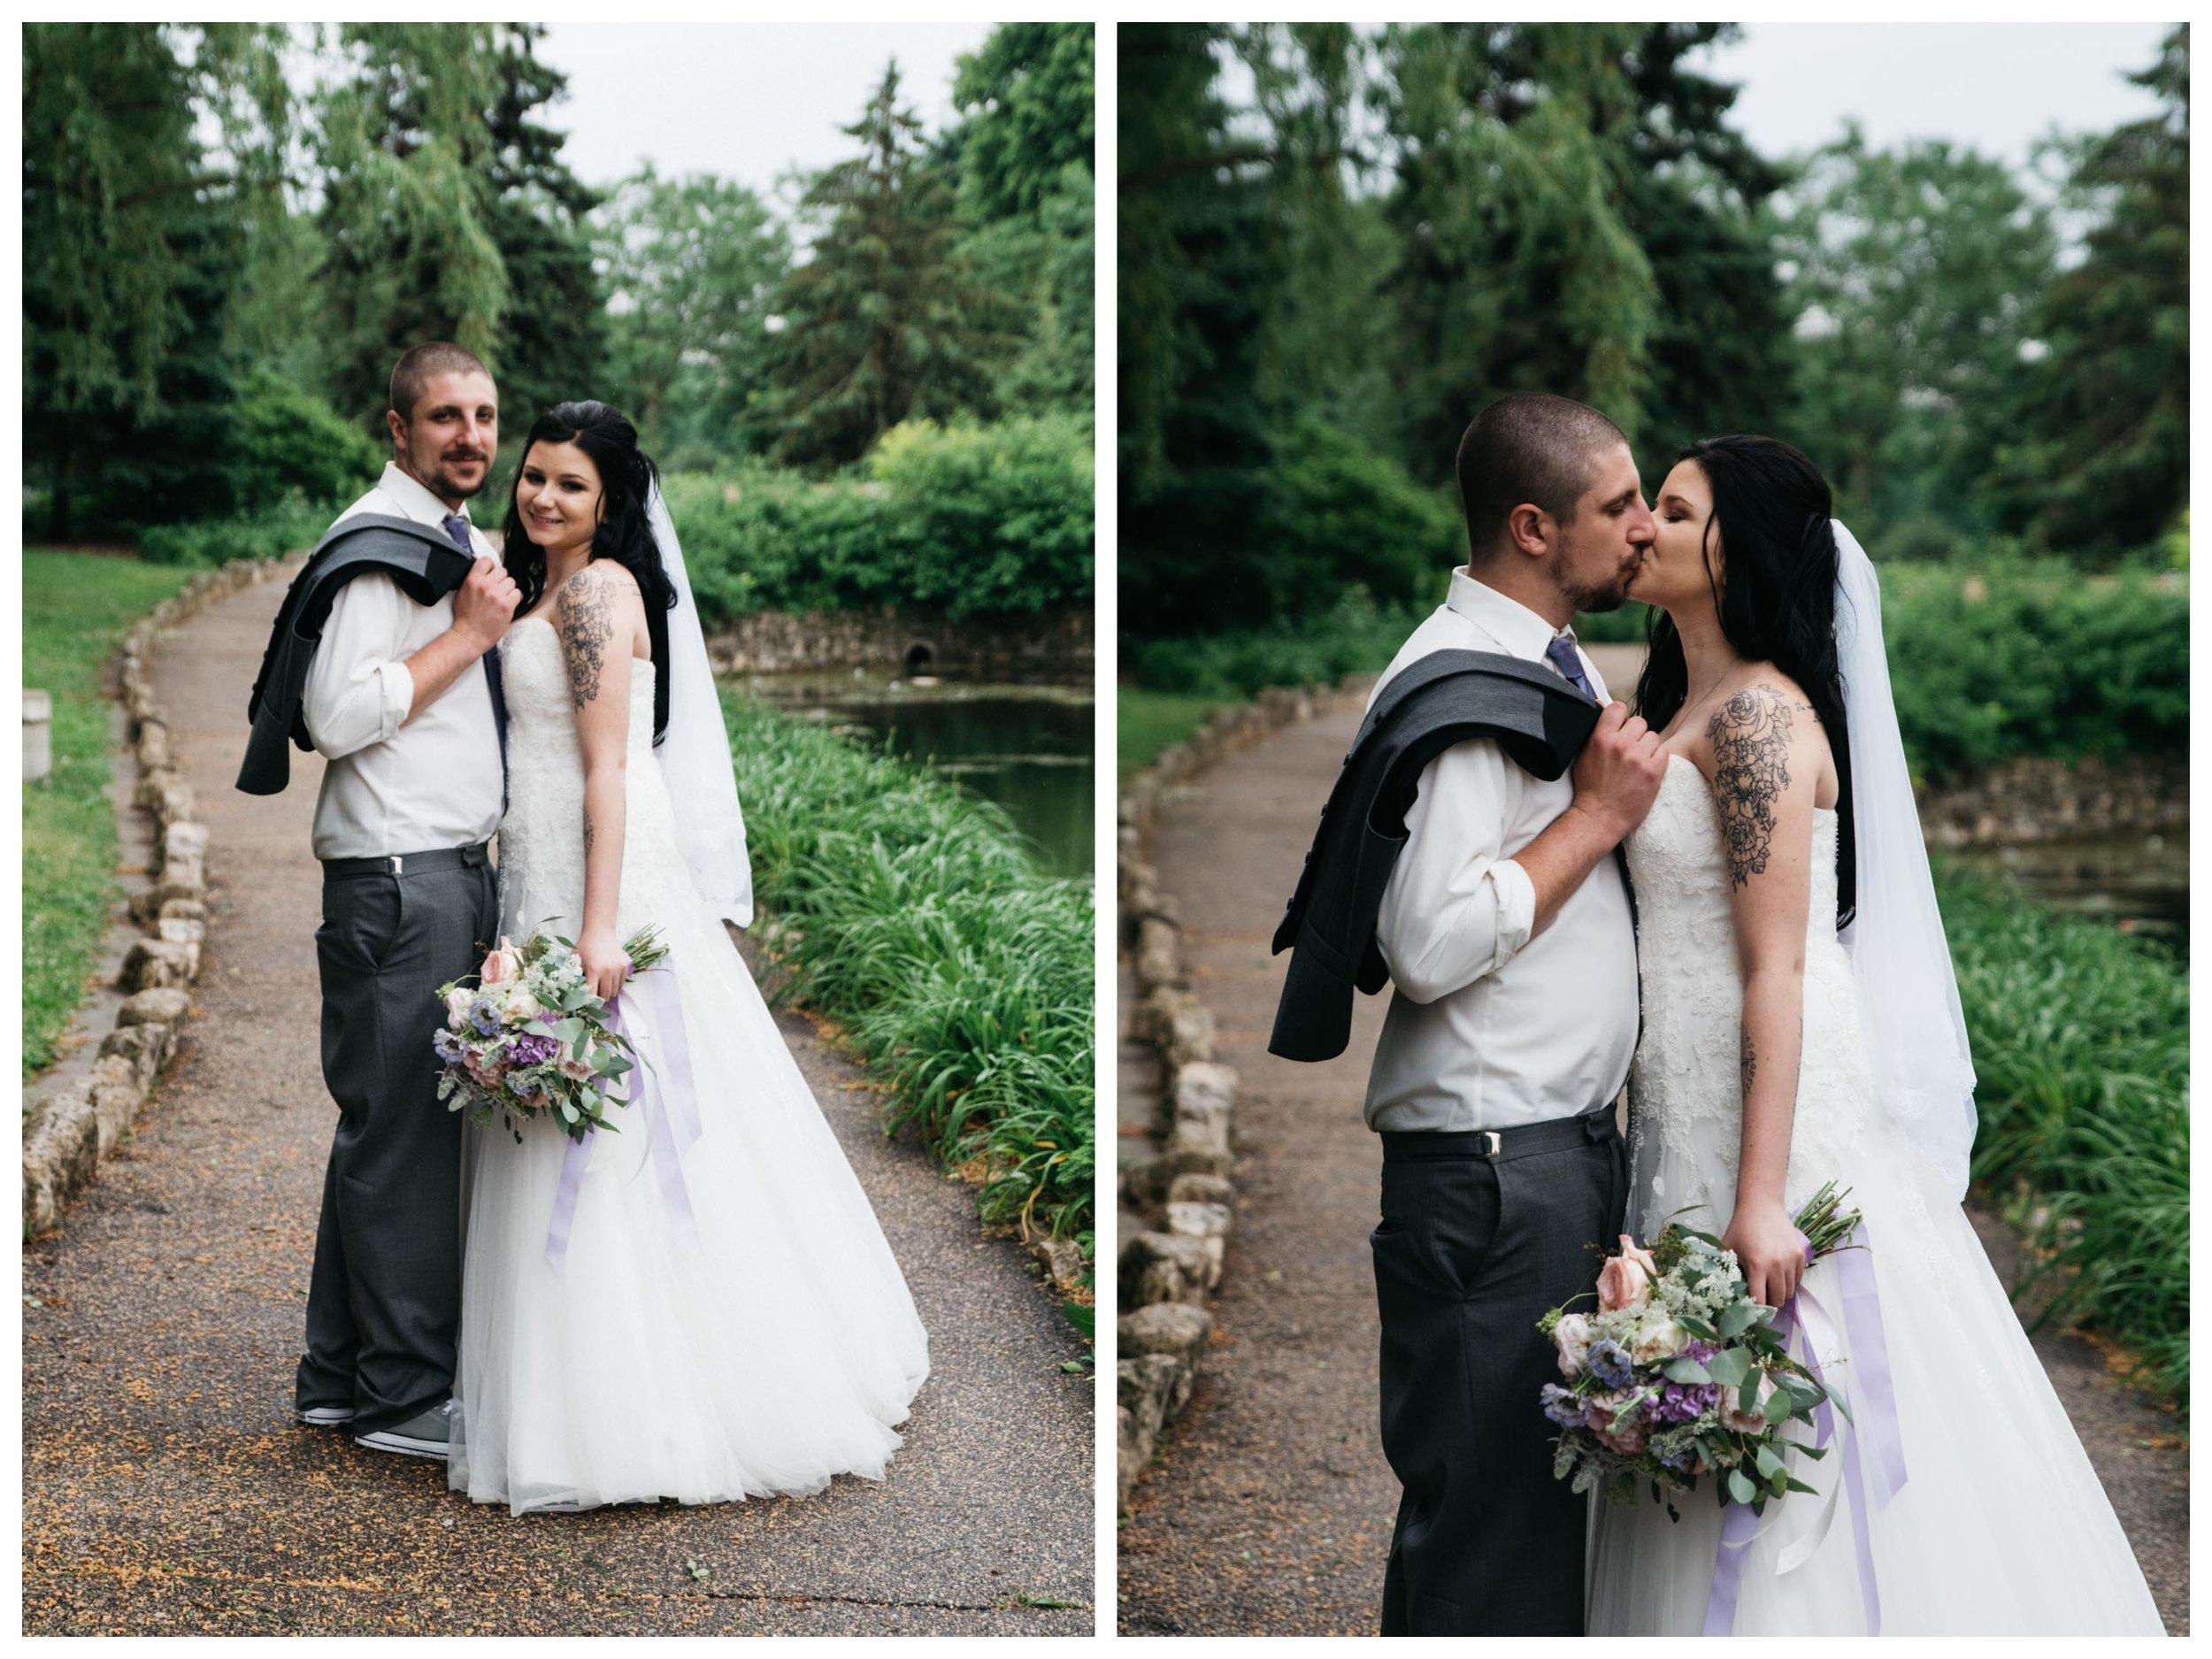 Kira and Skyler Wedding-21.jpg